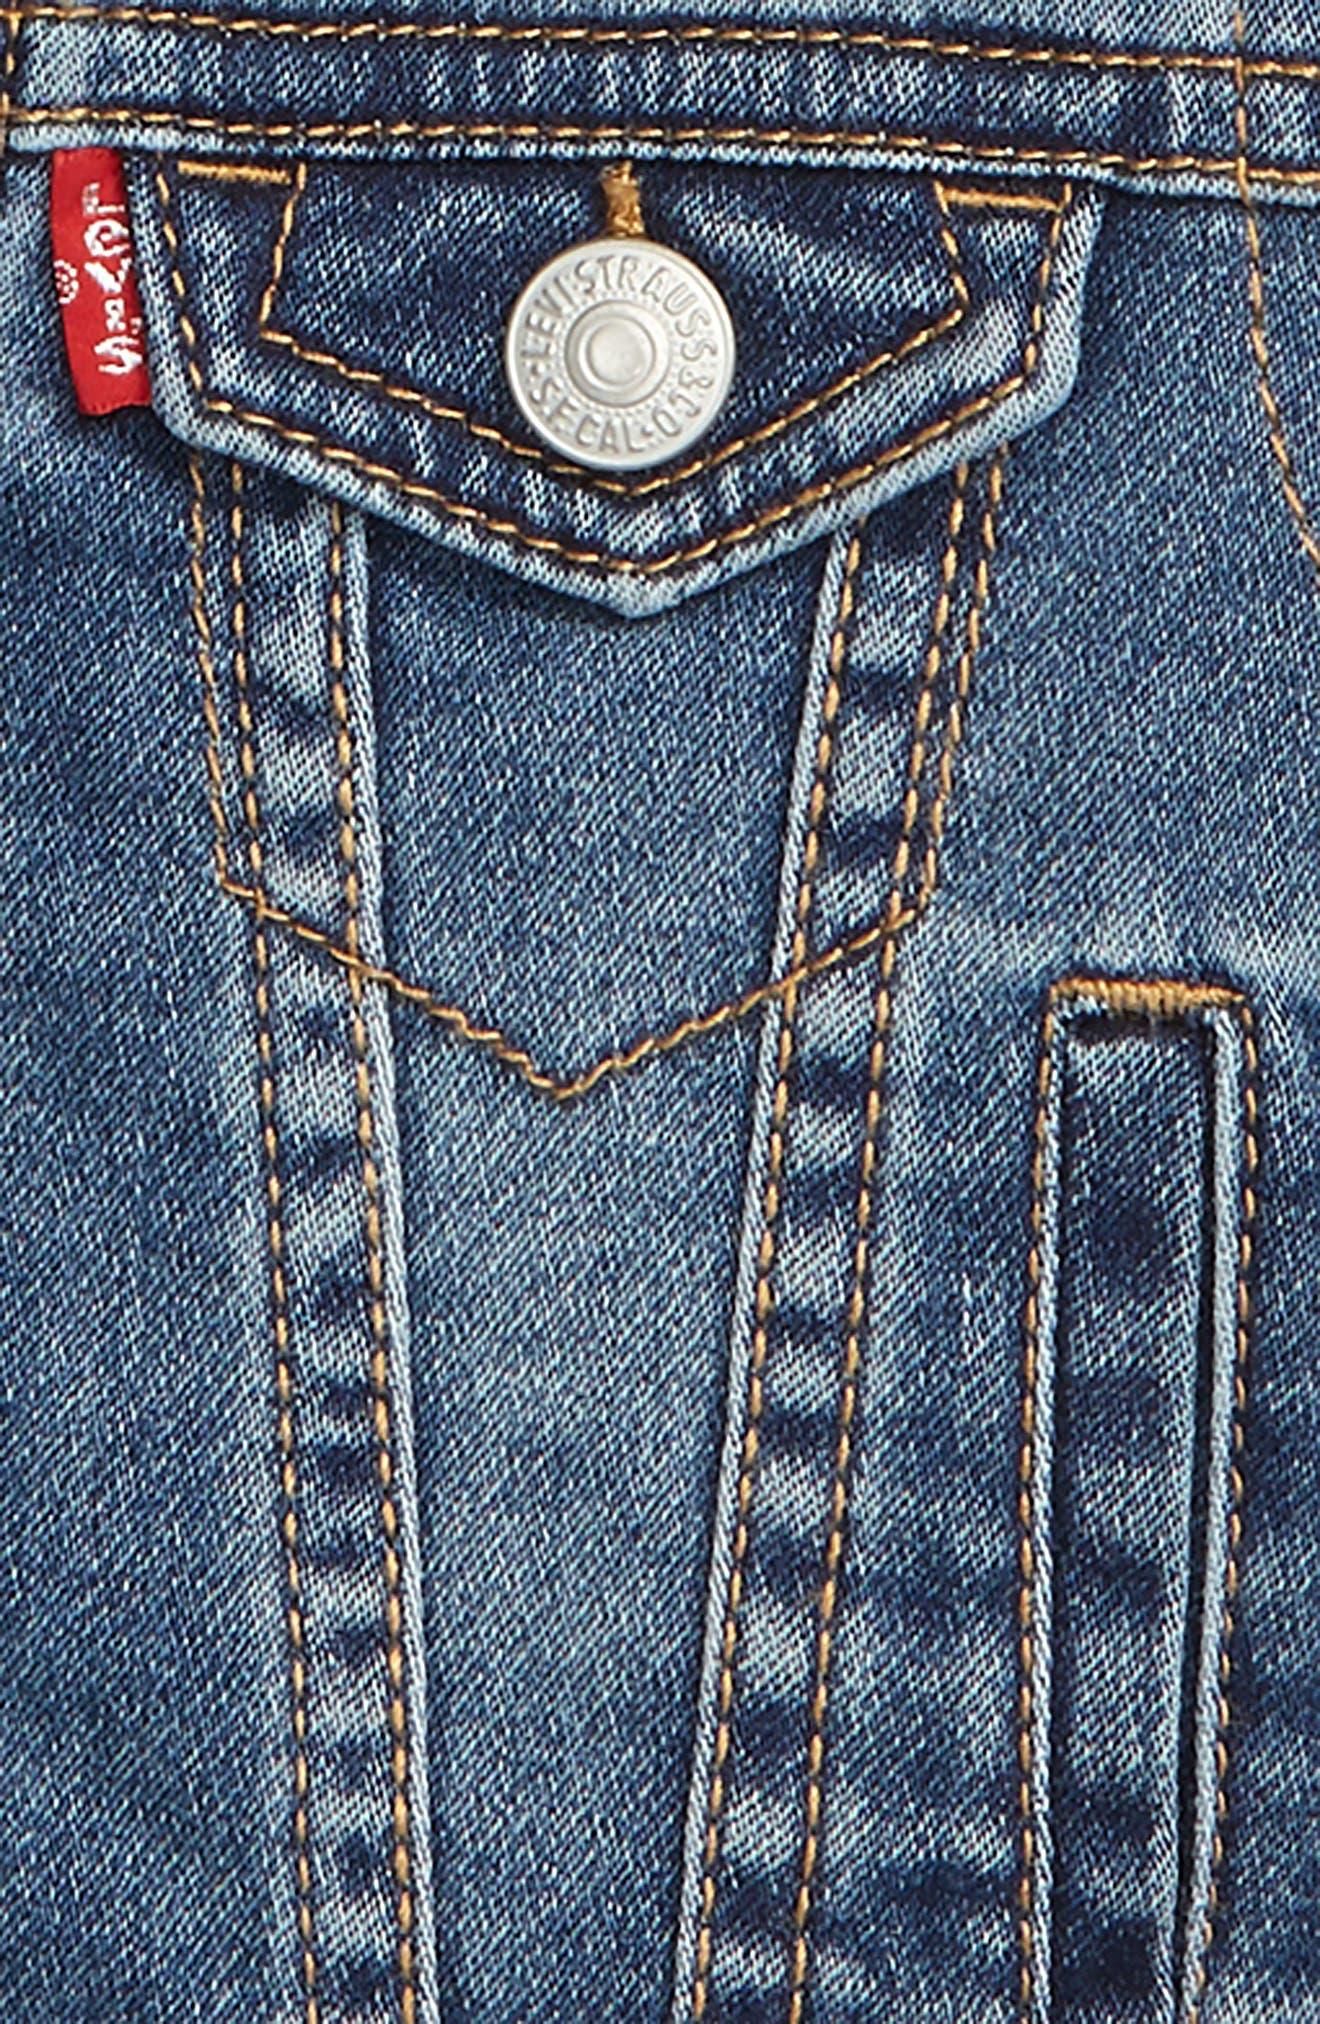 Levi's<sup>®</sup> Indigo Hooded Trucker Jacket,                             Alternate thumbnail 2, color,                             452